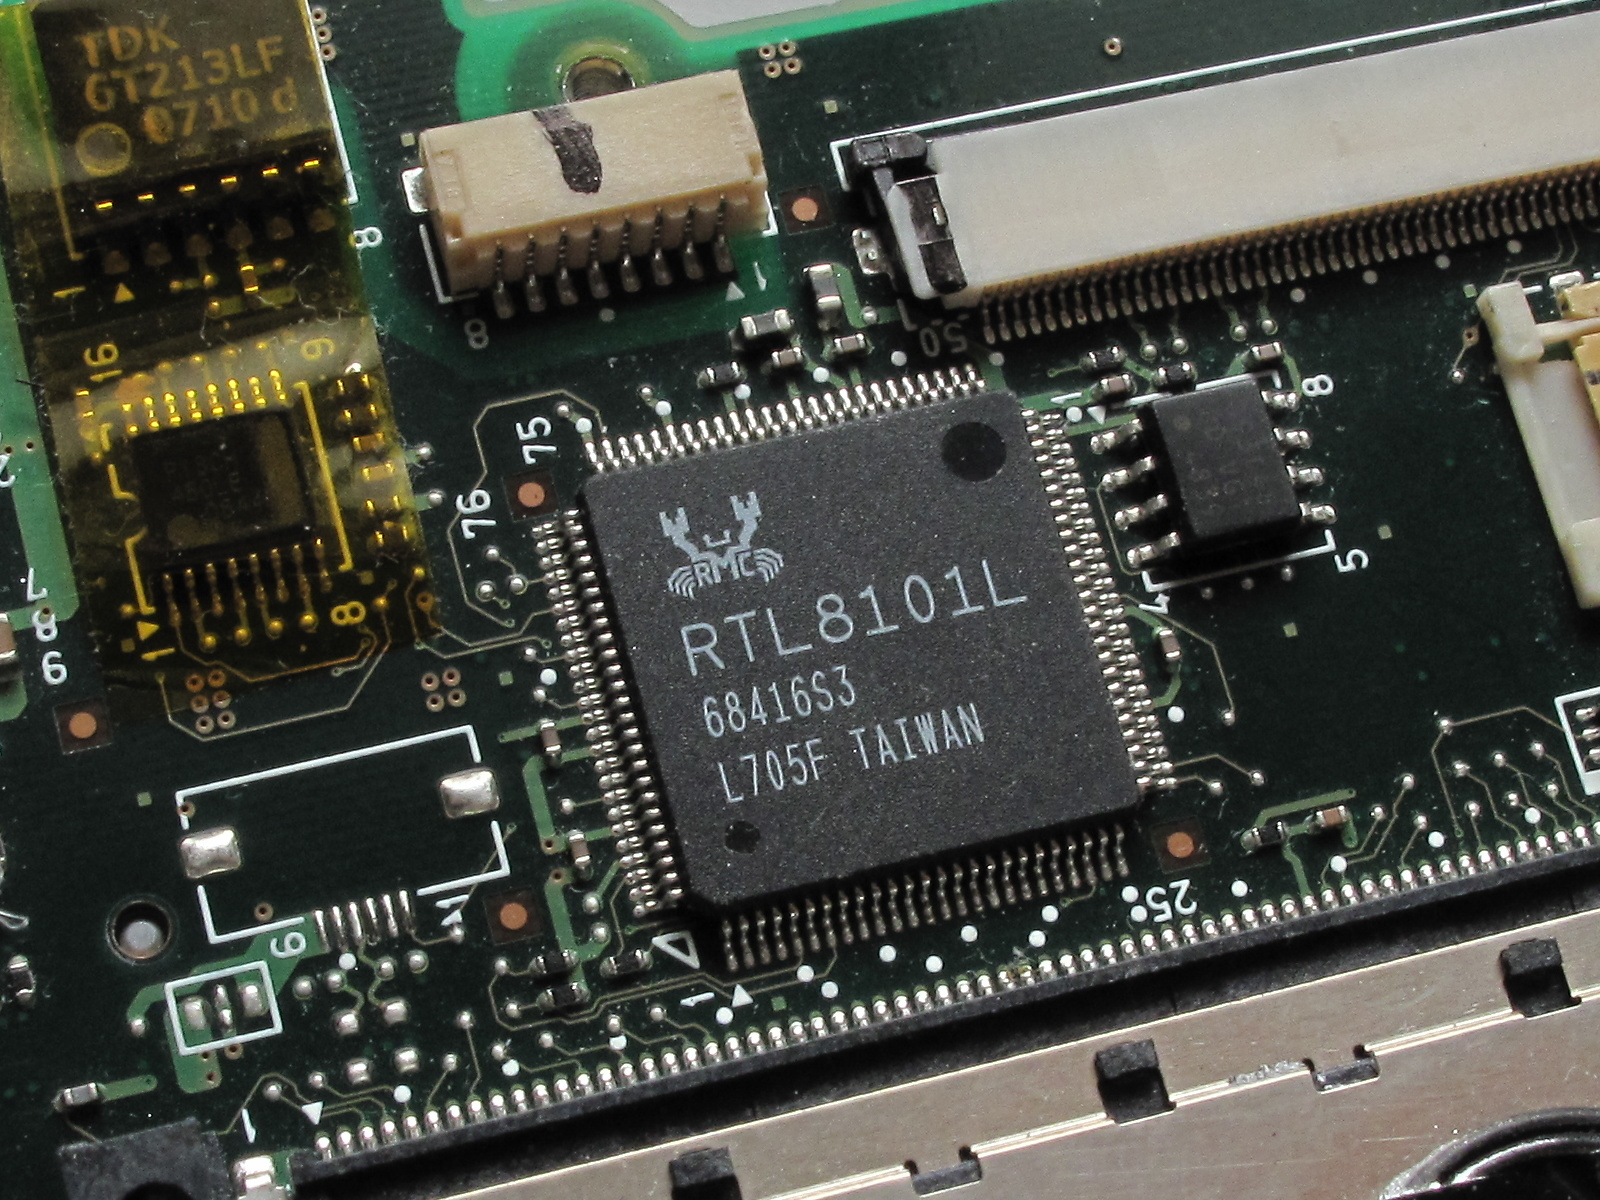 File:realtek rtl8101l fast ethernet controller. Jpg wikimedia commons.